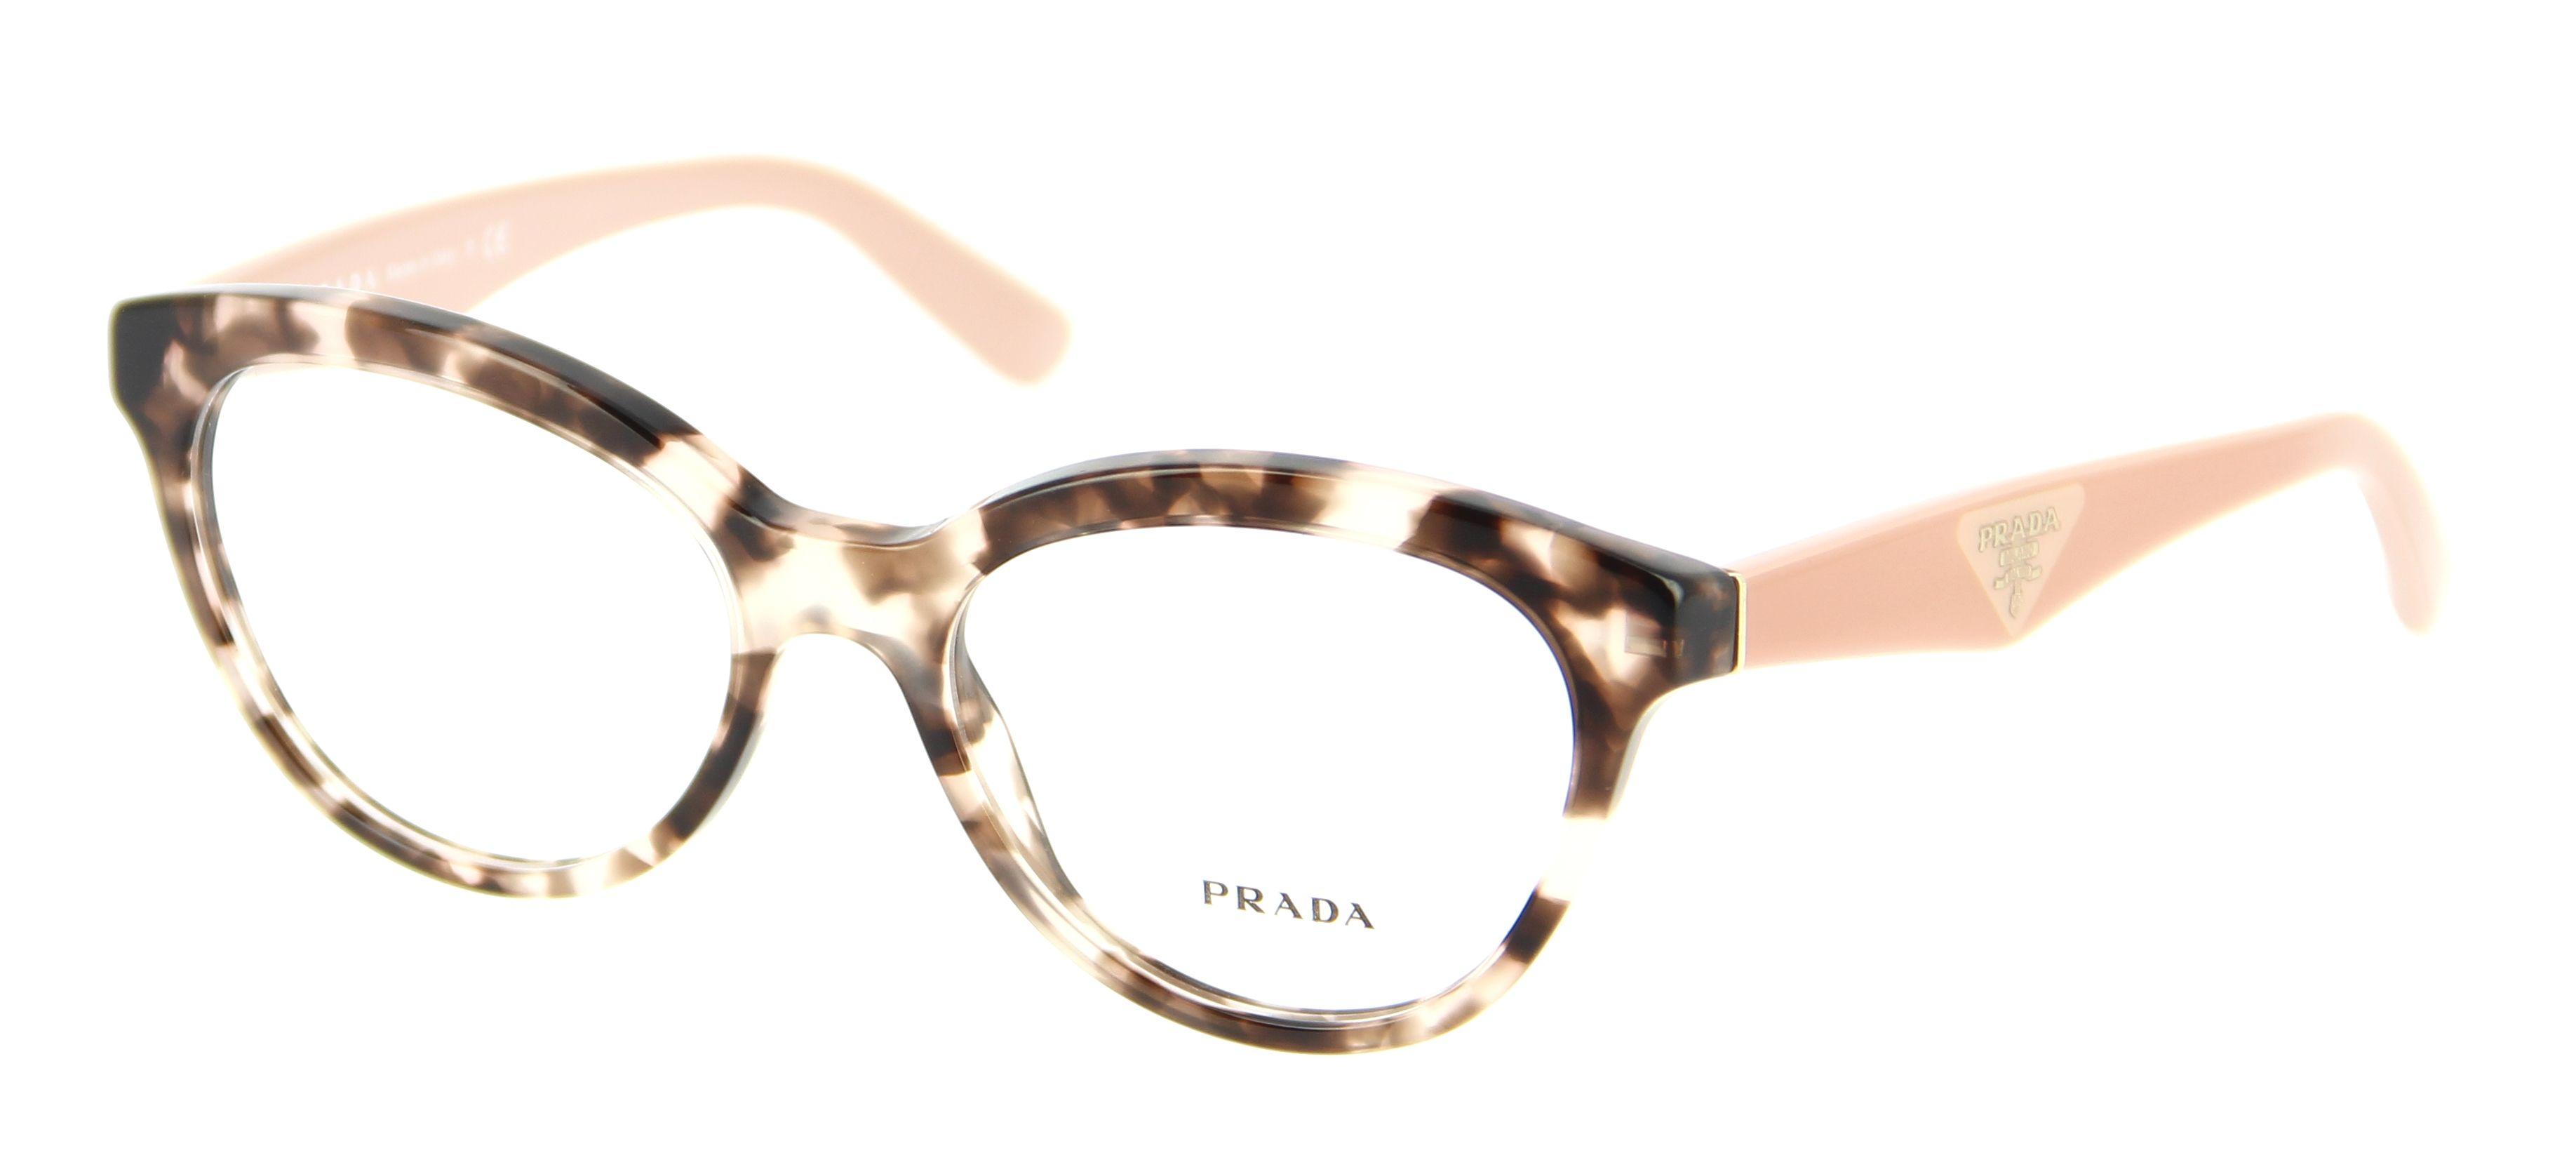 lunettes de vue pr 11rv roj101 50 17 prada spectacles. Black Bedroom Furniture Sets. Home Design Ideas